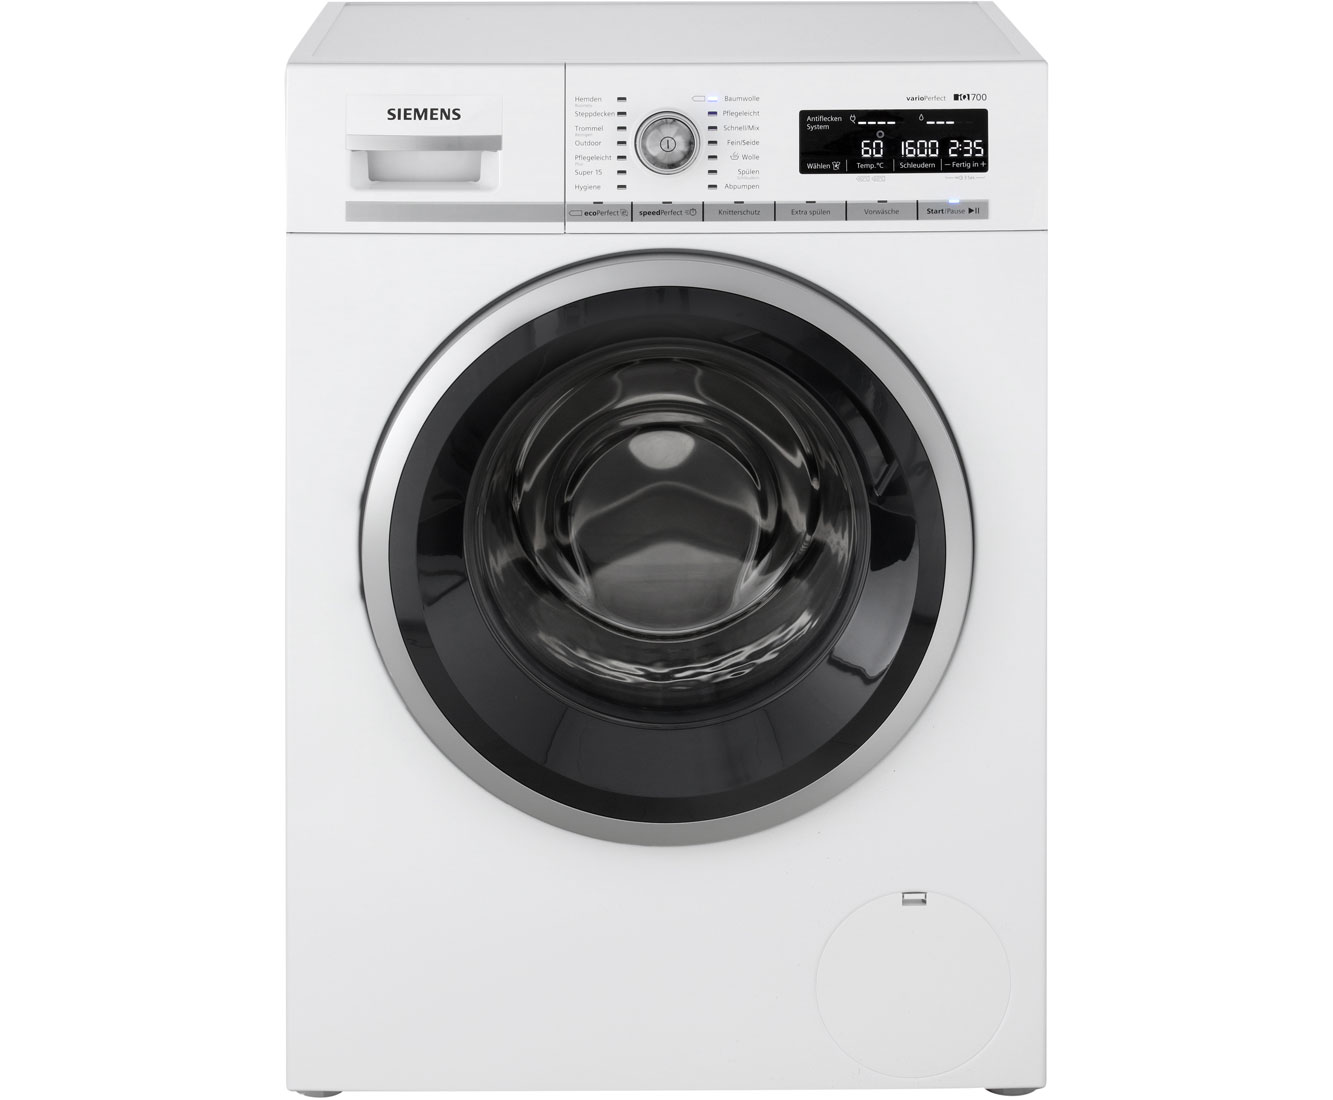 Siemens Iq700 Wm16w540 Waschmaschine Weiss 8 Kg 1600 U Min A